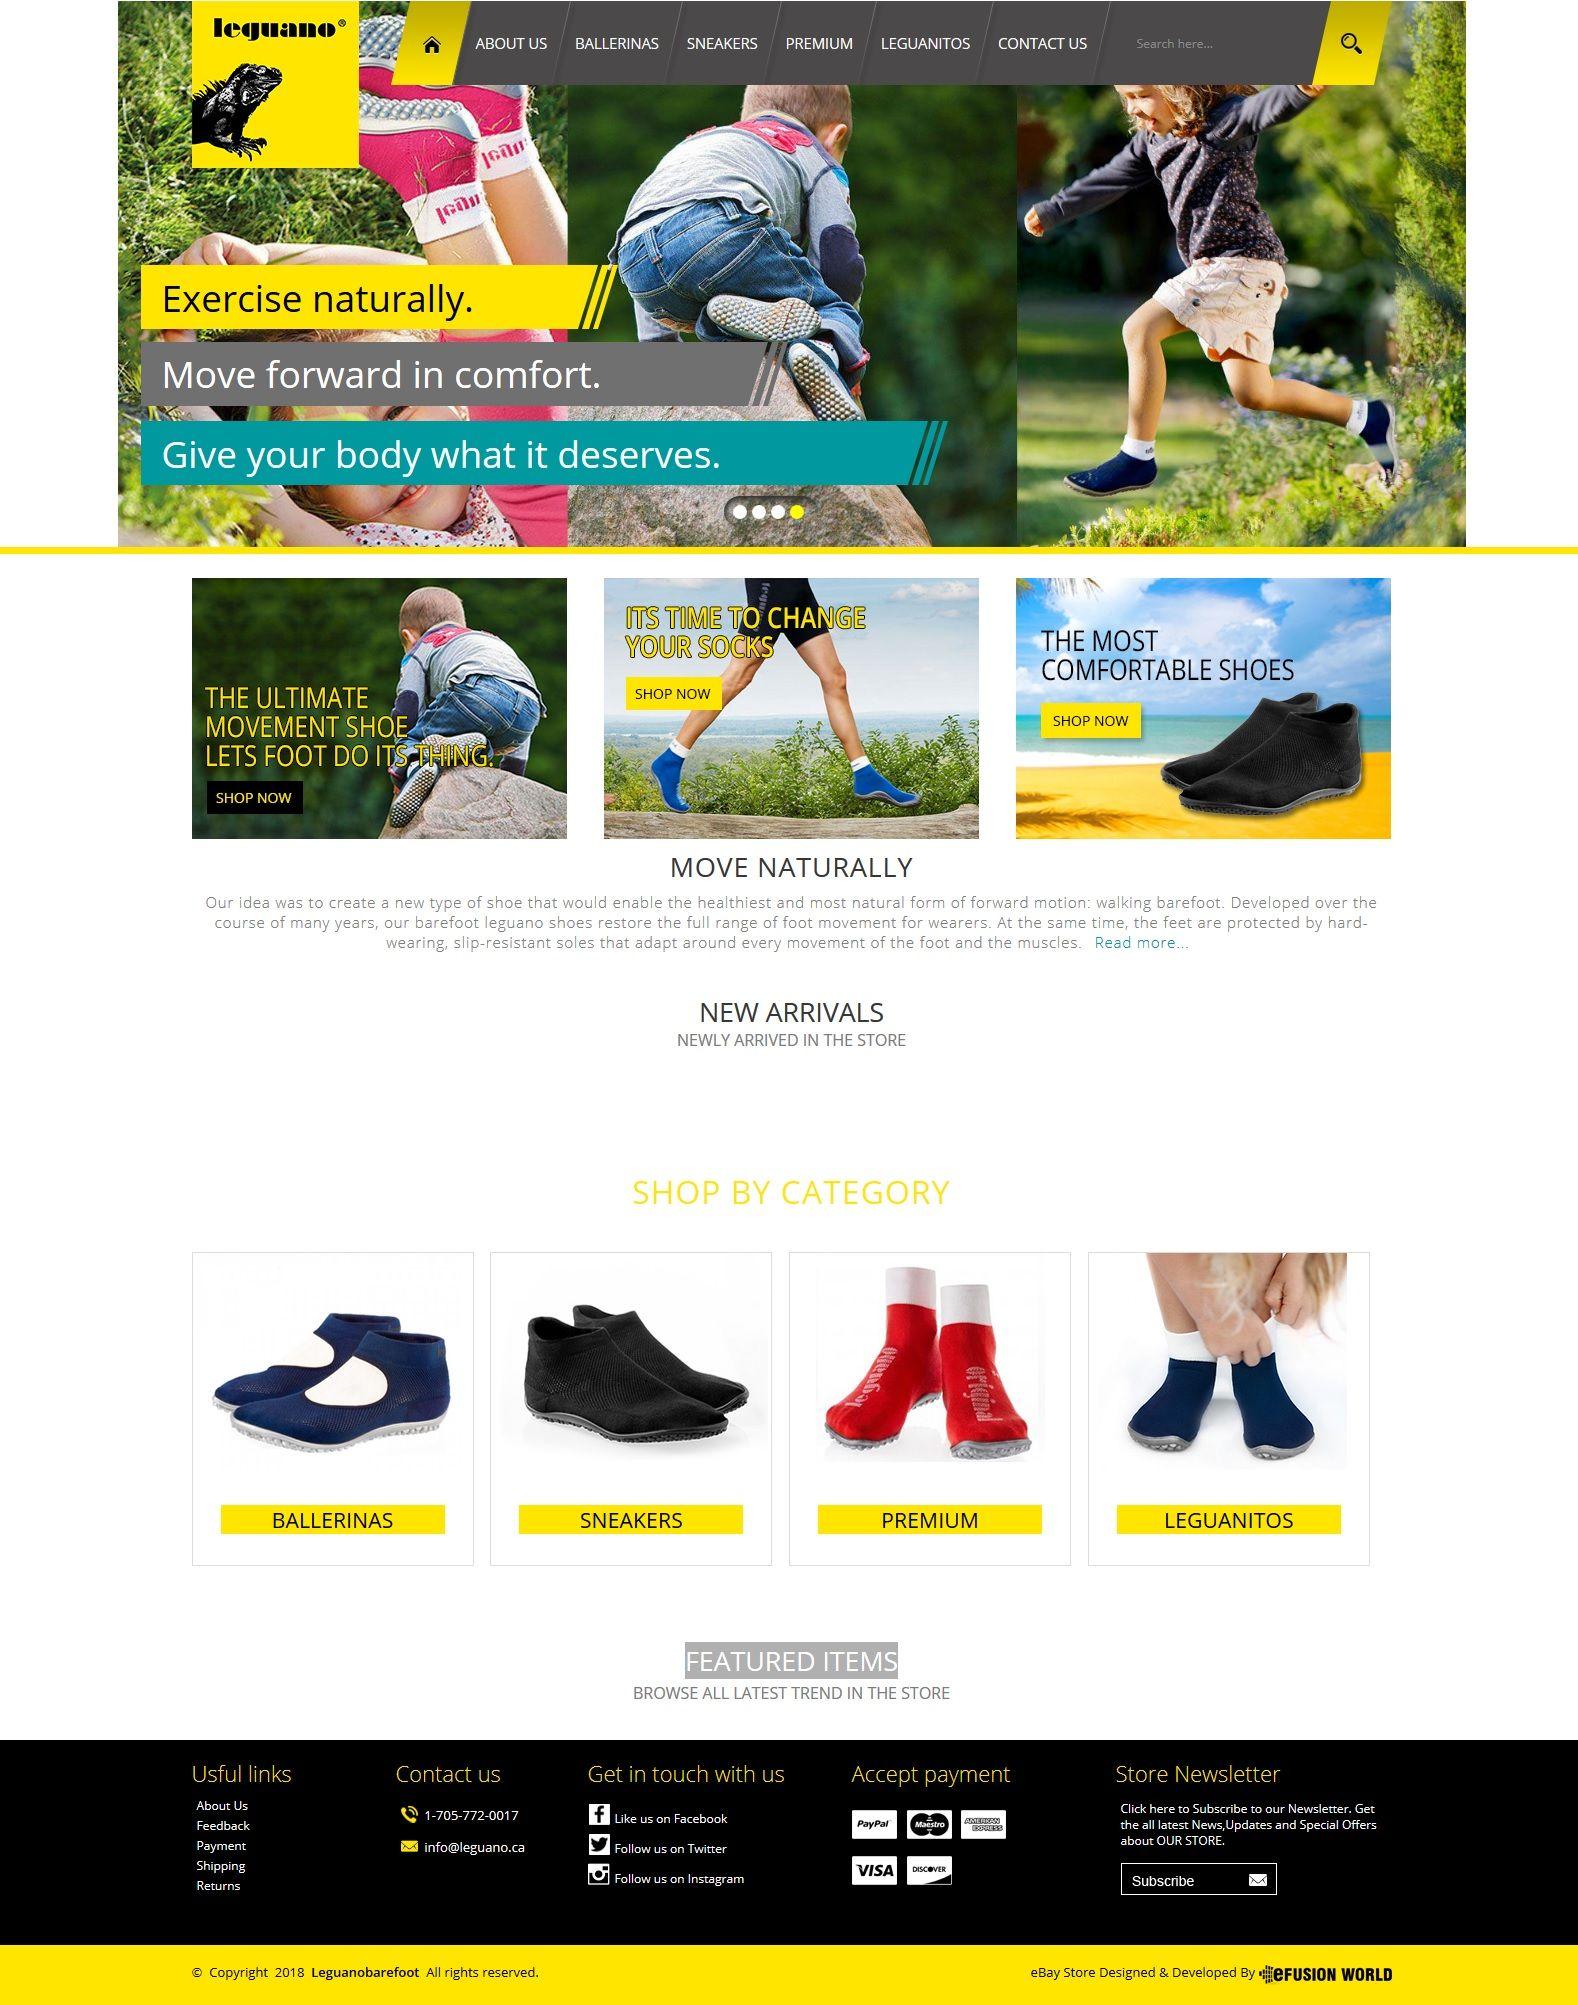 Efusionworld provide ebay template designs and complete ebay efusionworld provide ebay template designs and complete ebay shop setup services maxwellsz